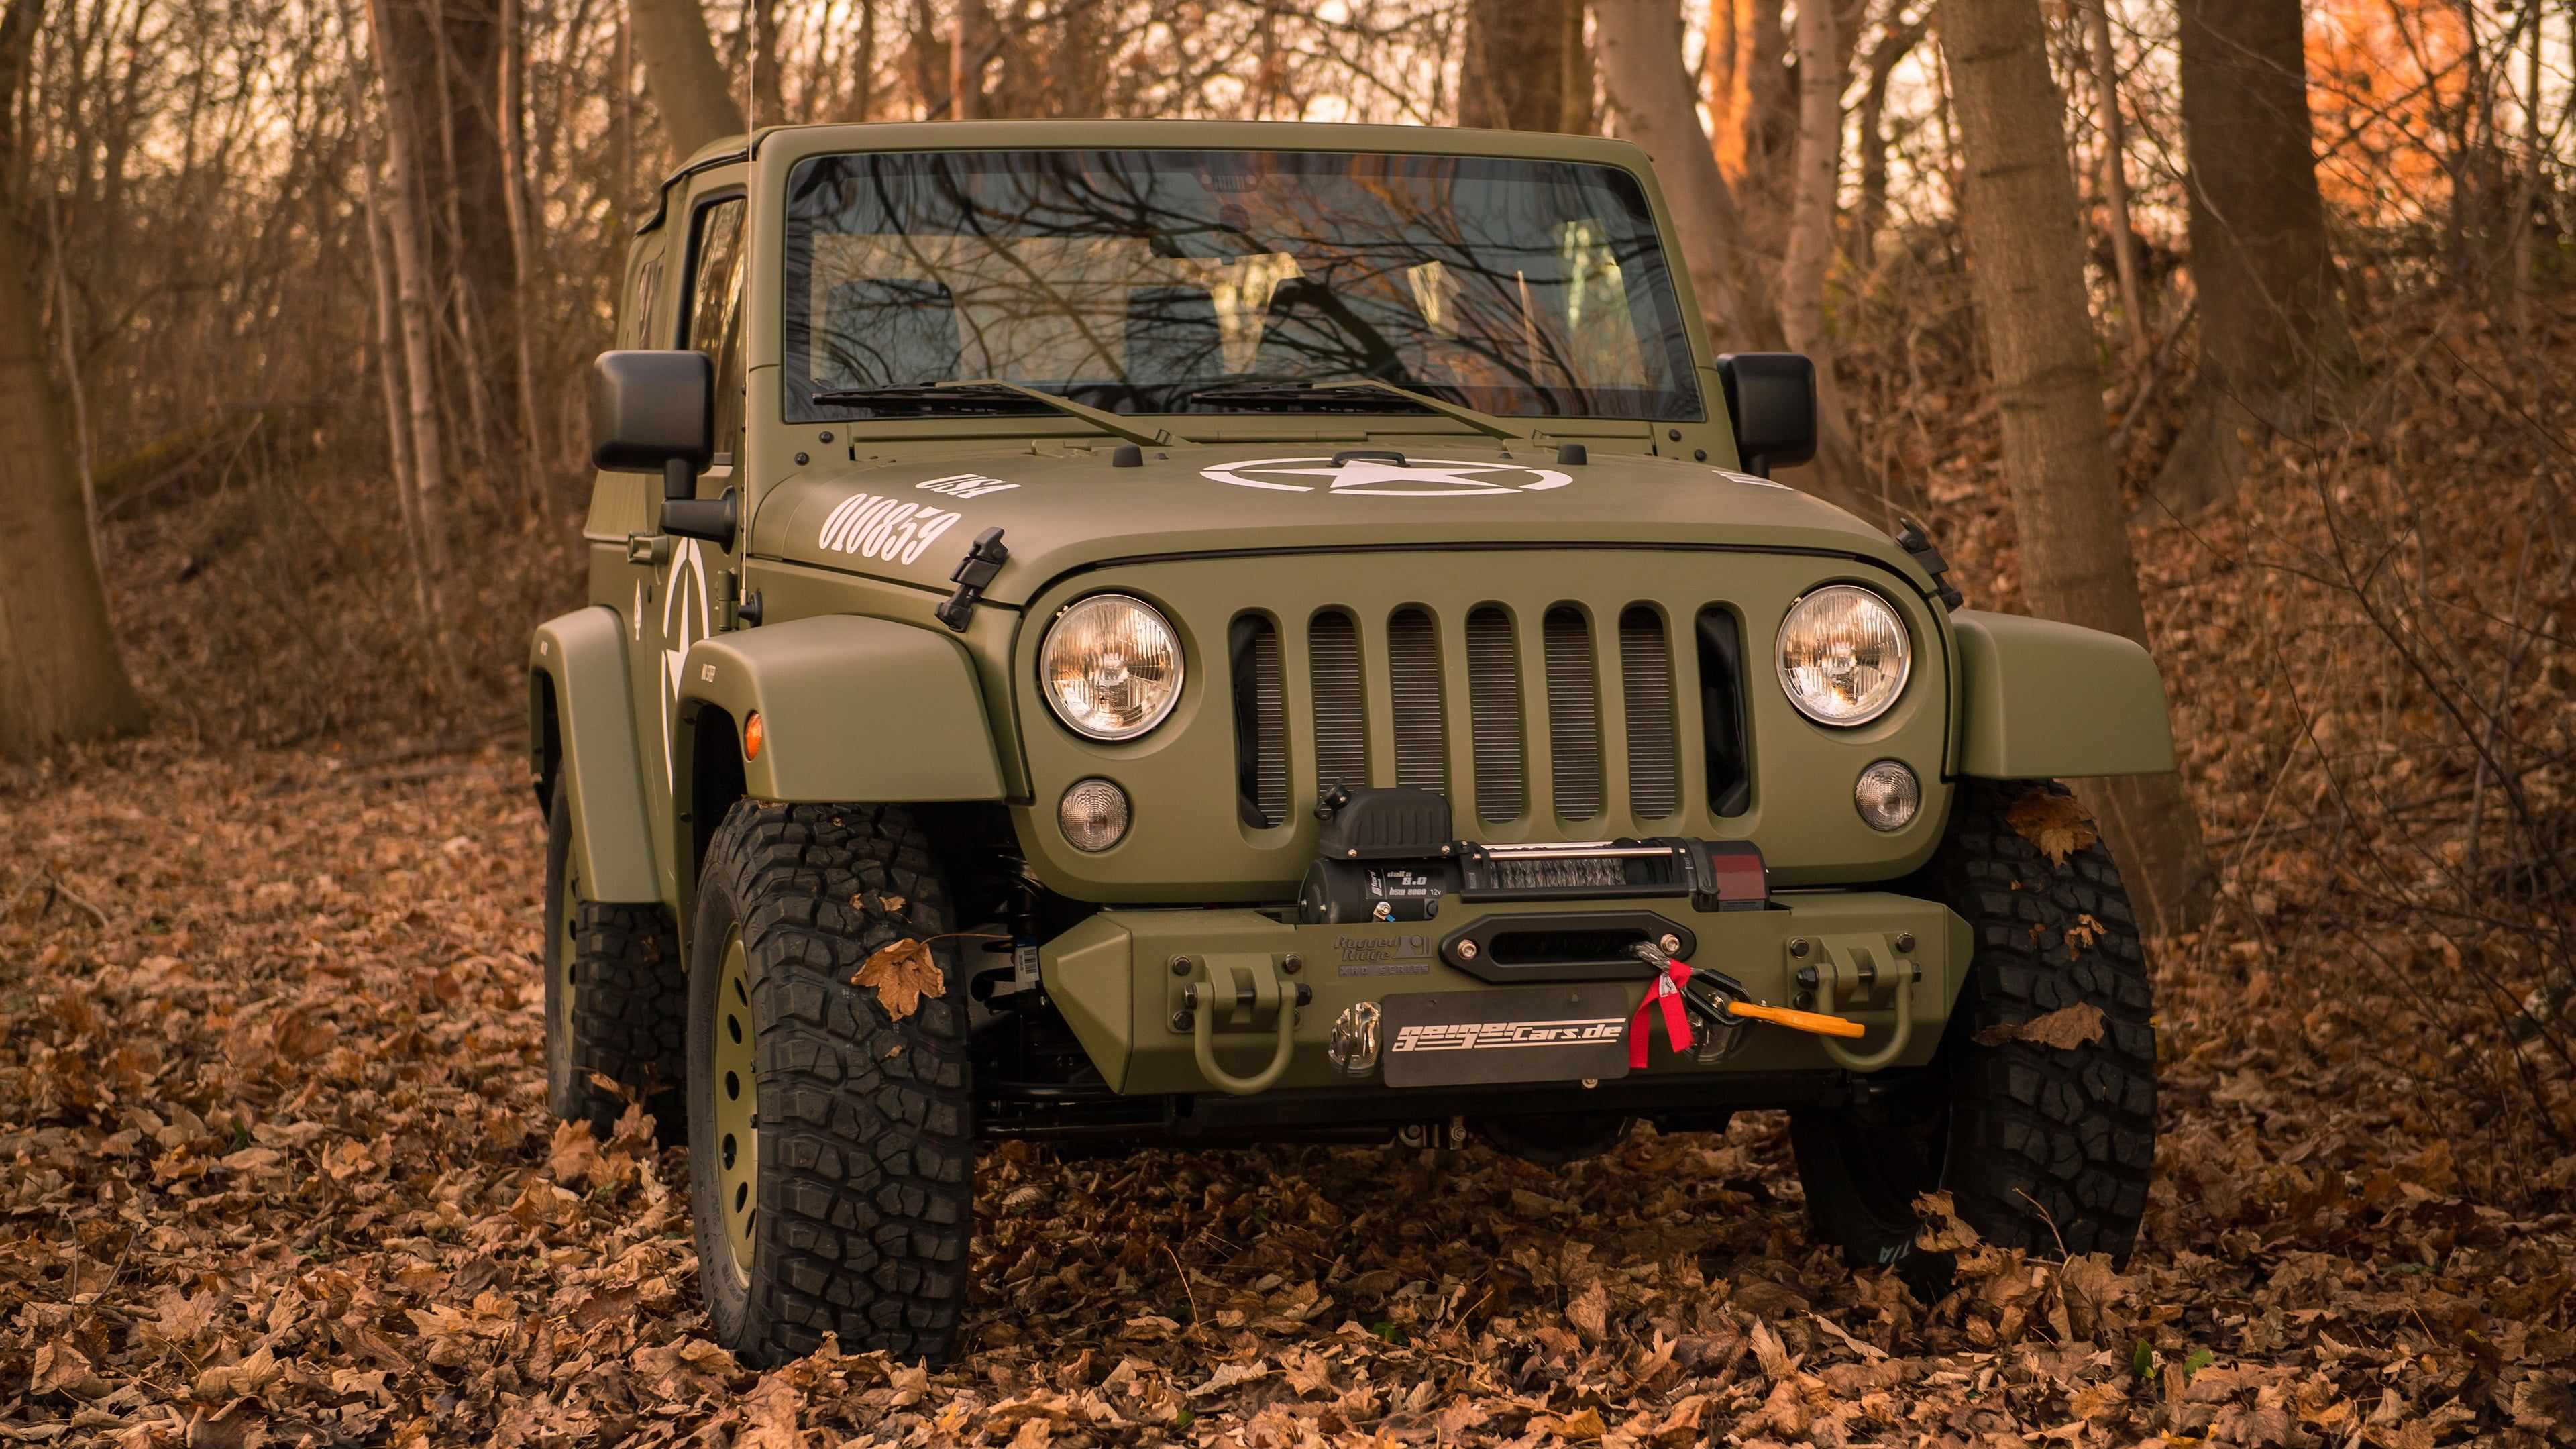 Off Roading Jeep Jeep Wrangler Off Road Vehicle Off Road Racing 4k Wallpaper Hdwallpaper Desktop In 2020 Jeep Wrangler Jeep Willys